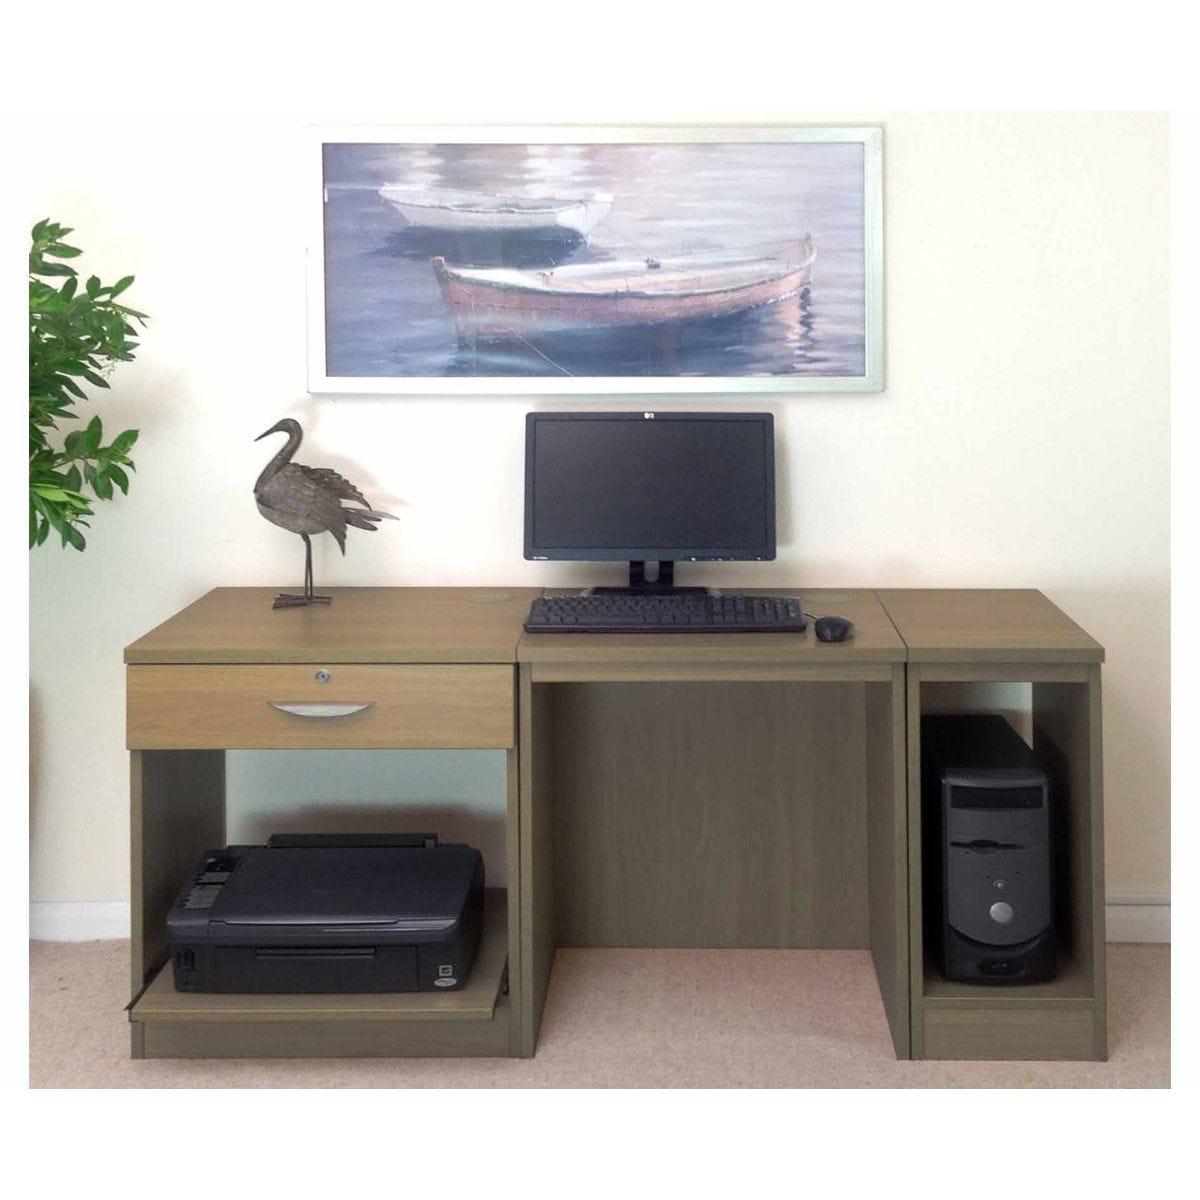 R White Home Office Furniture Desk, English Oak Wood Grain